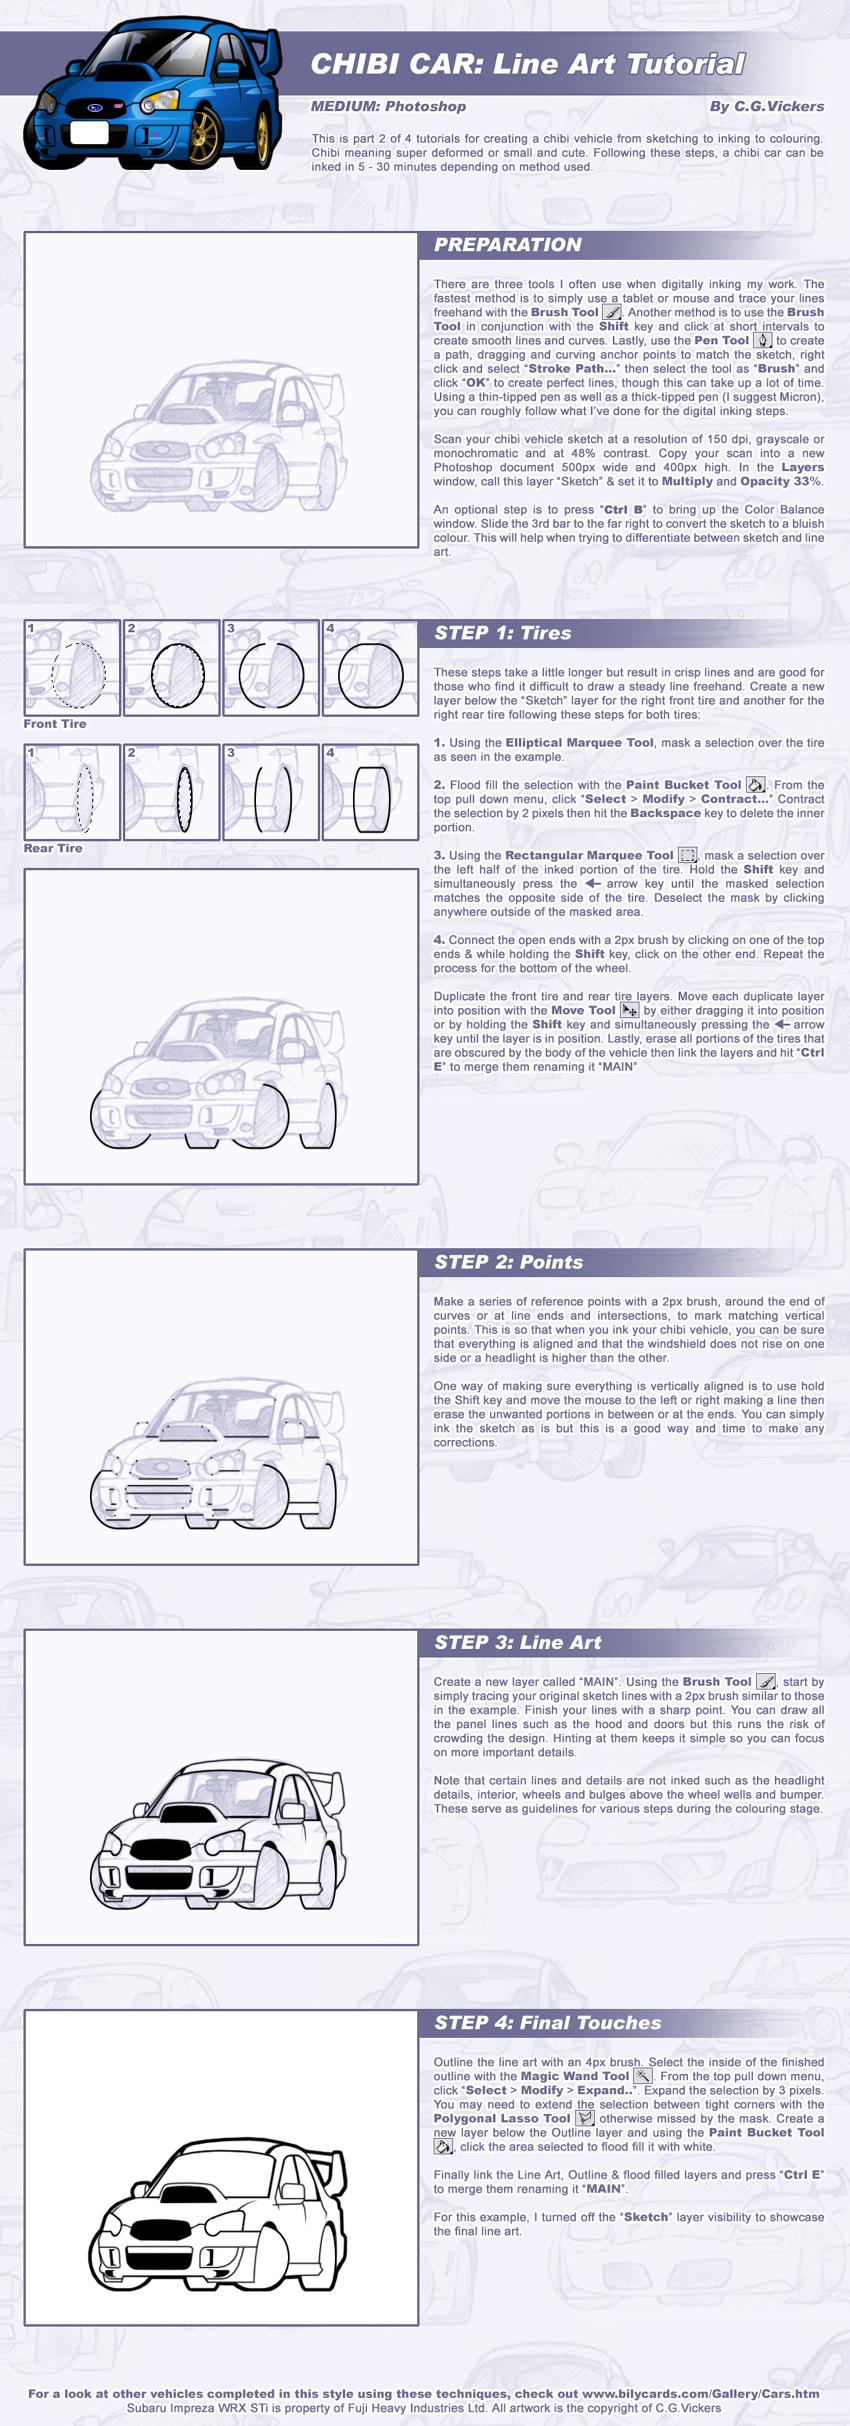 Chibi car line art tutorial by cgvickers on deviantart chibi car line art tutorial by cgvickers baditri Gallery